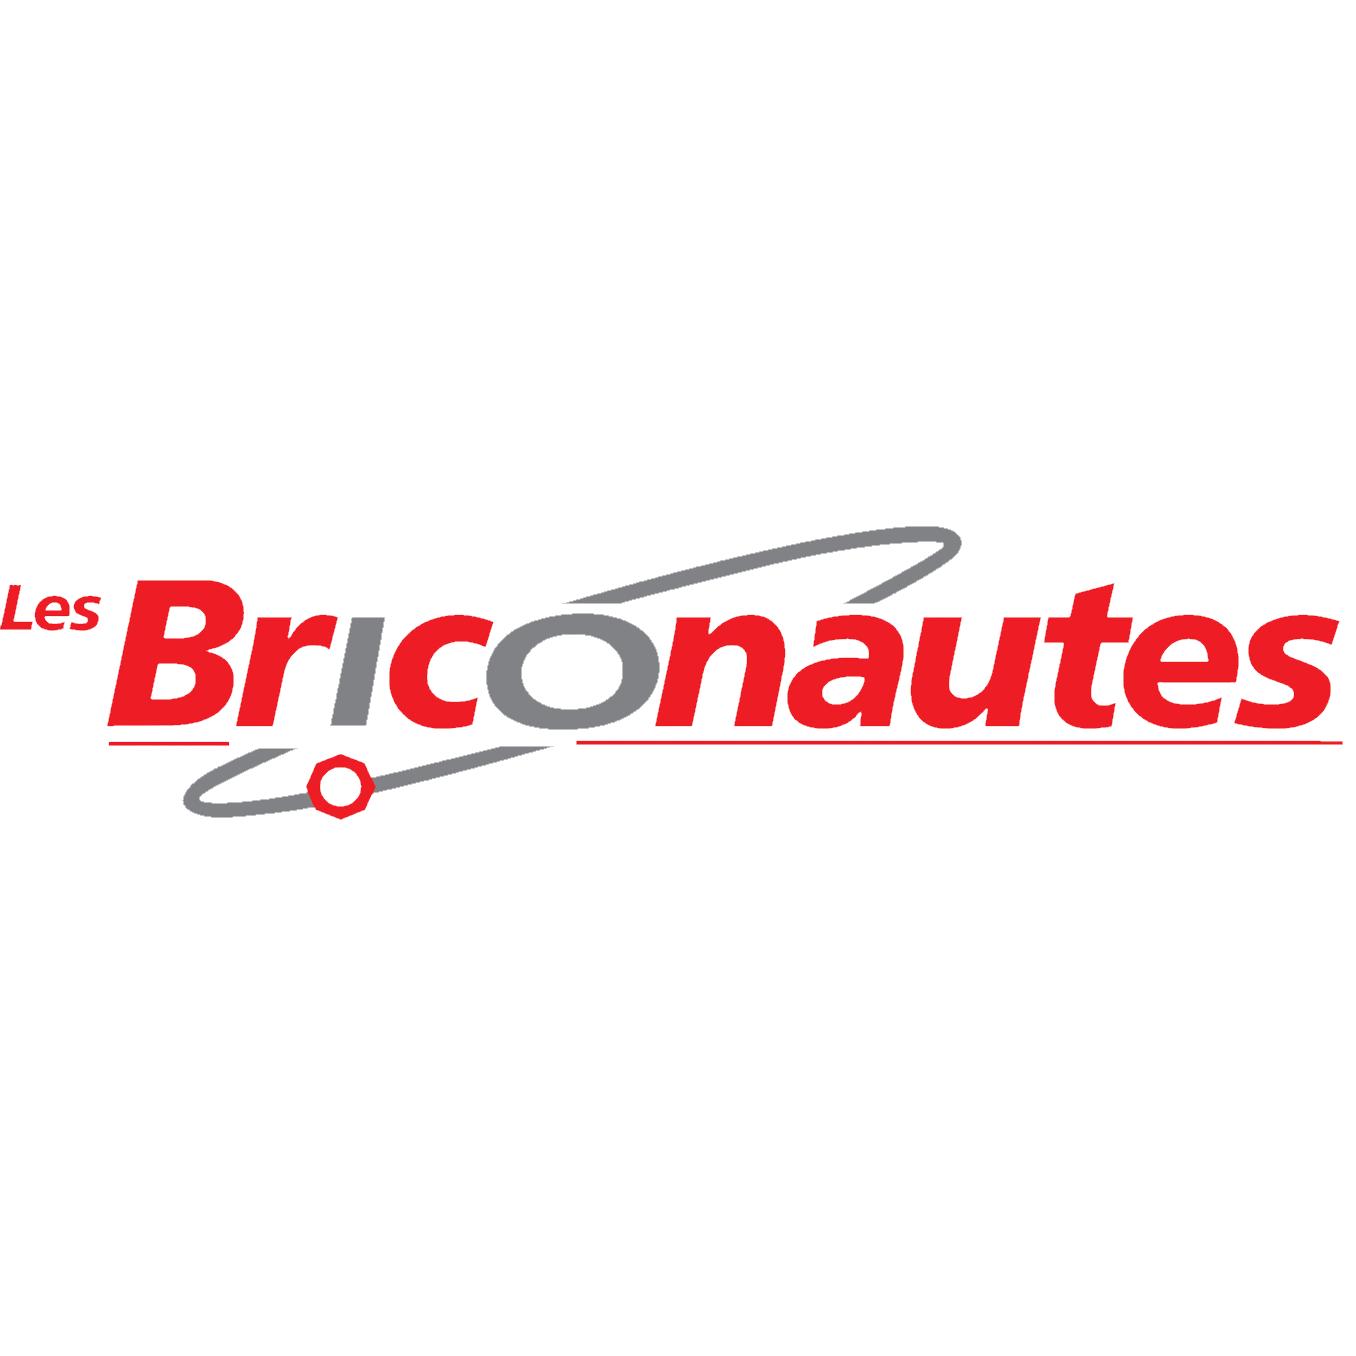 briconautes logo